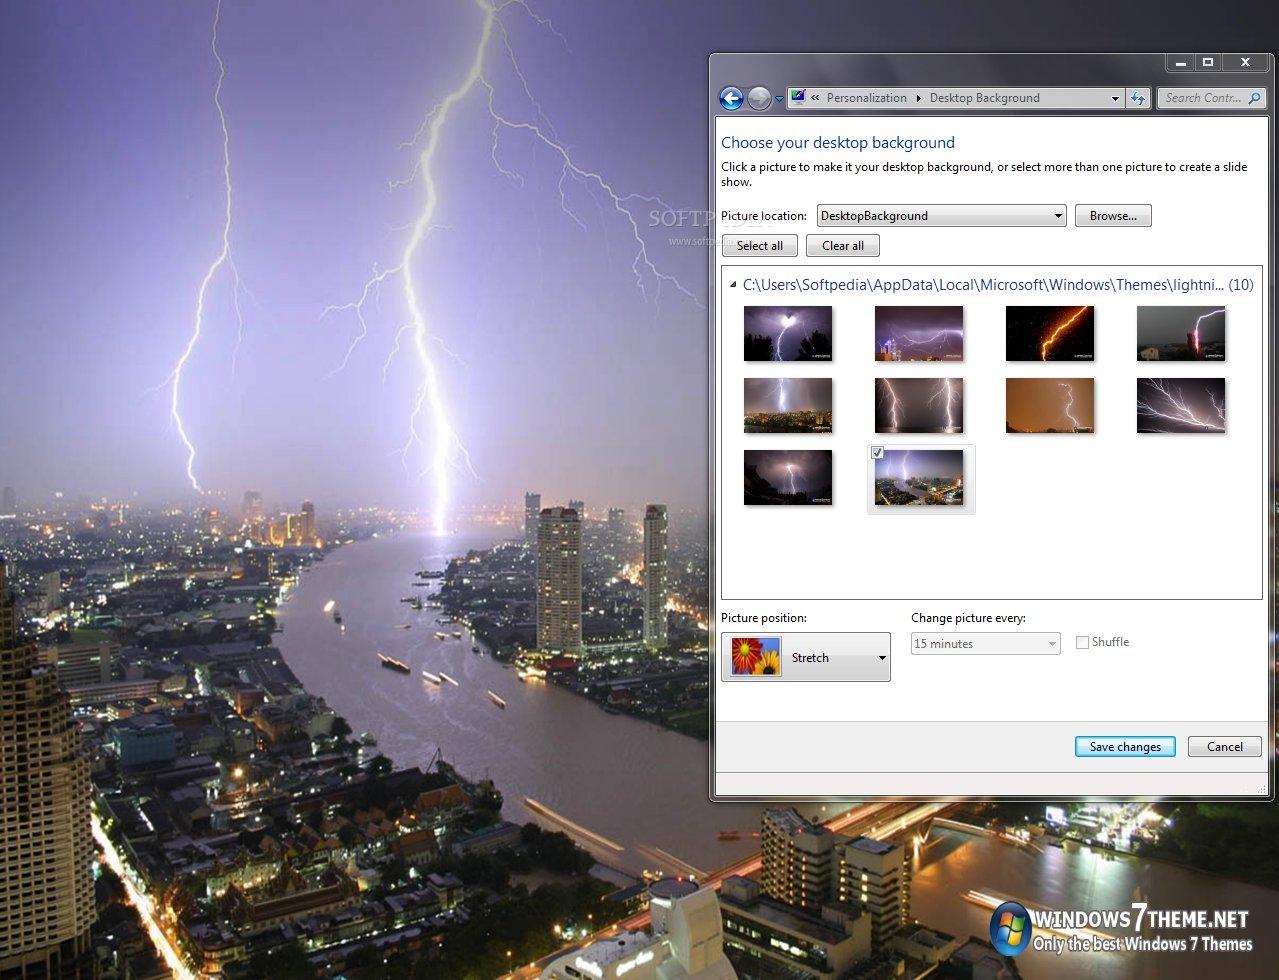 Lightning Windows 7 Theme screenshot 1 - A sample of what  Lightning Windows 7 Theme can do for your desktop.